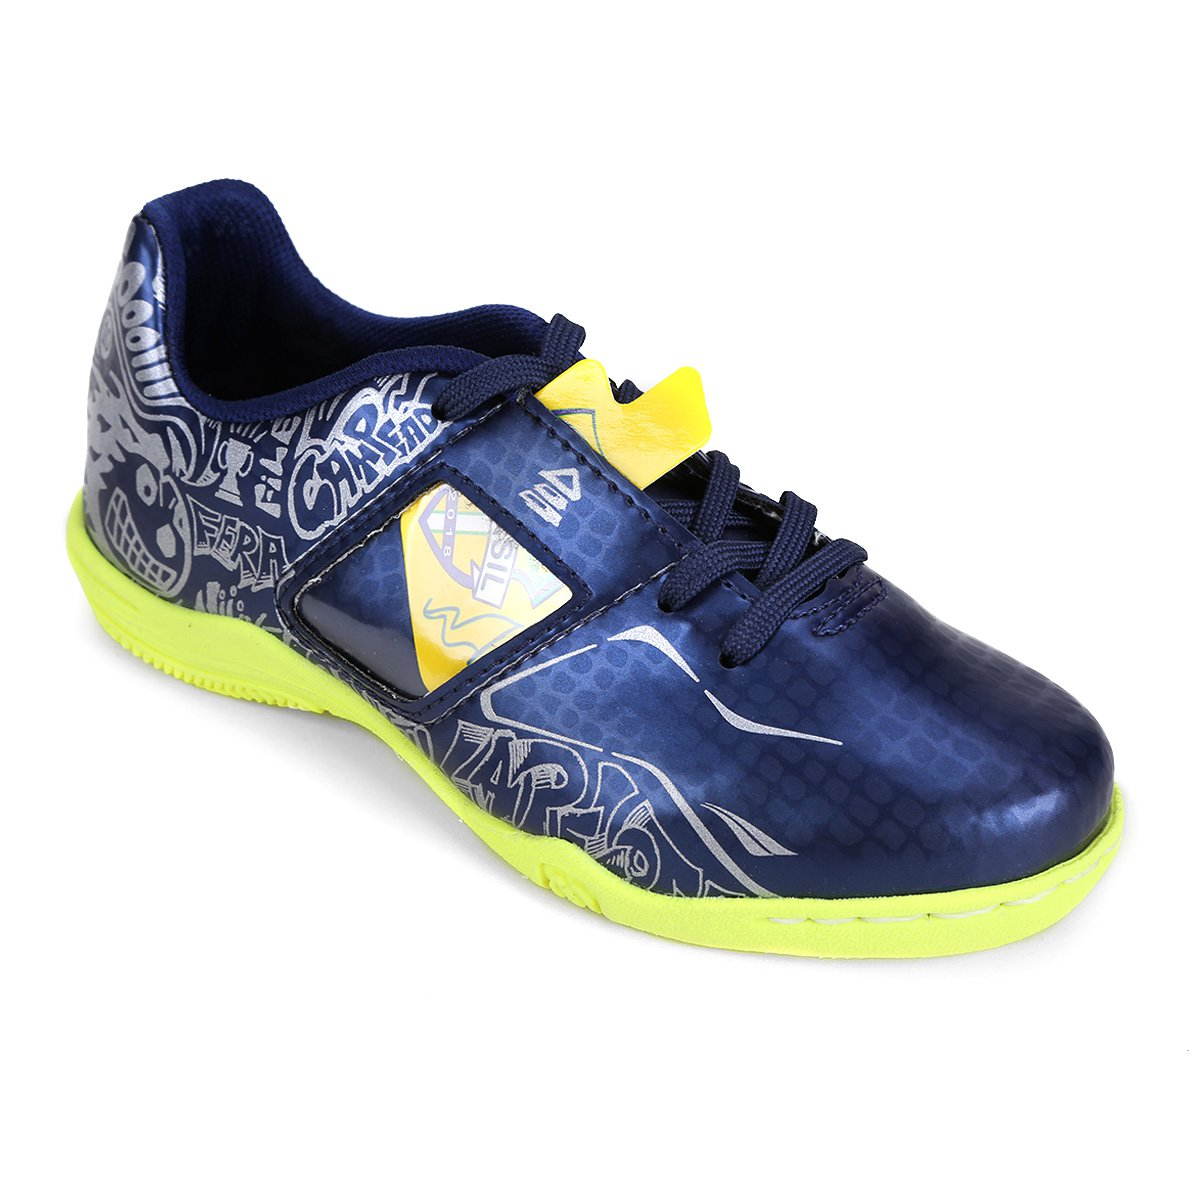 ... Chuteira Futsal Infantil Penalty Personalizável Freestyle Seleções ... 00aaf226c1d8e